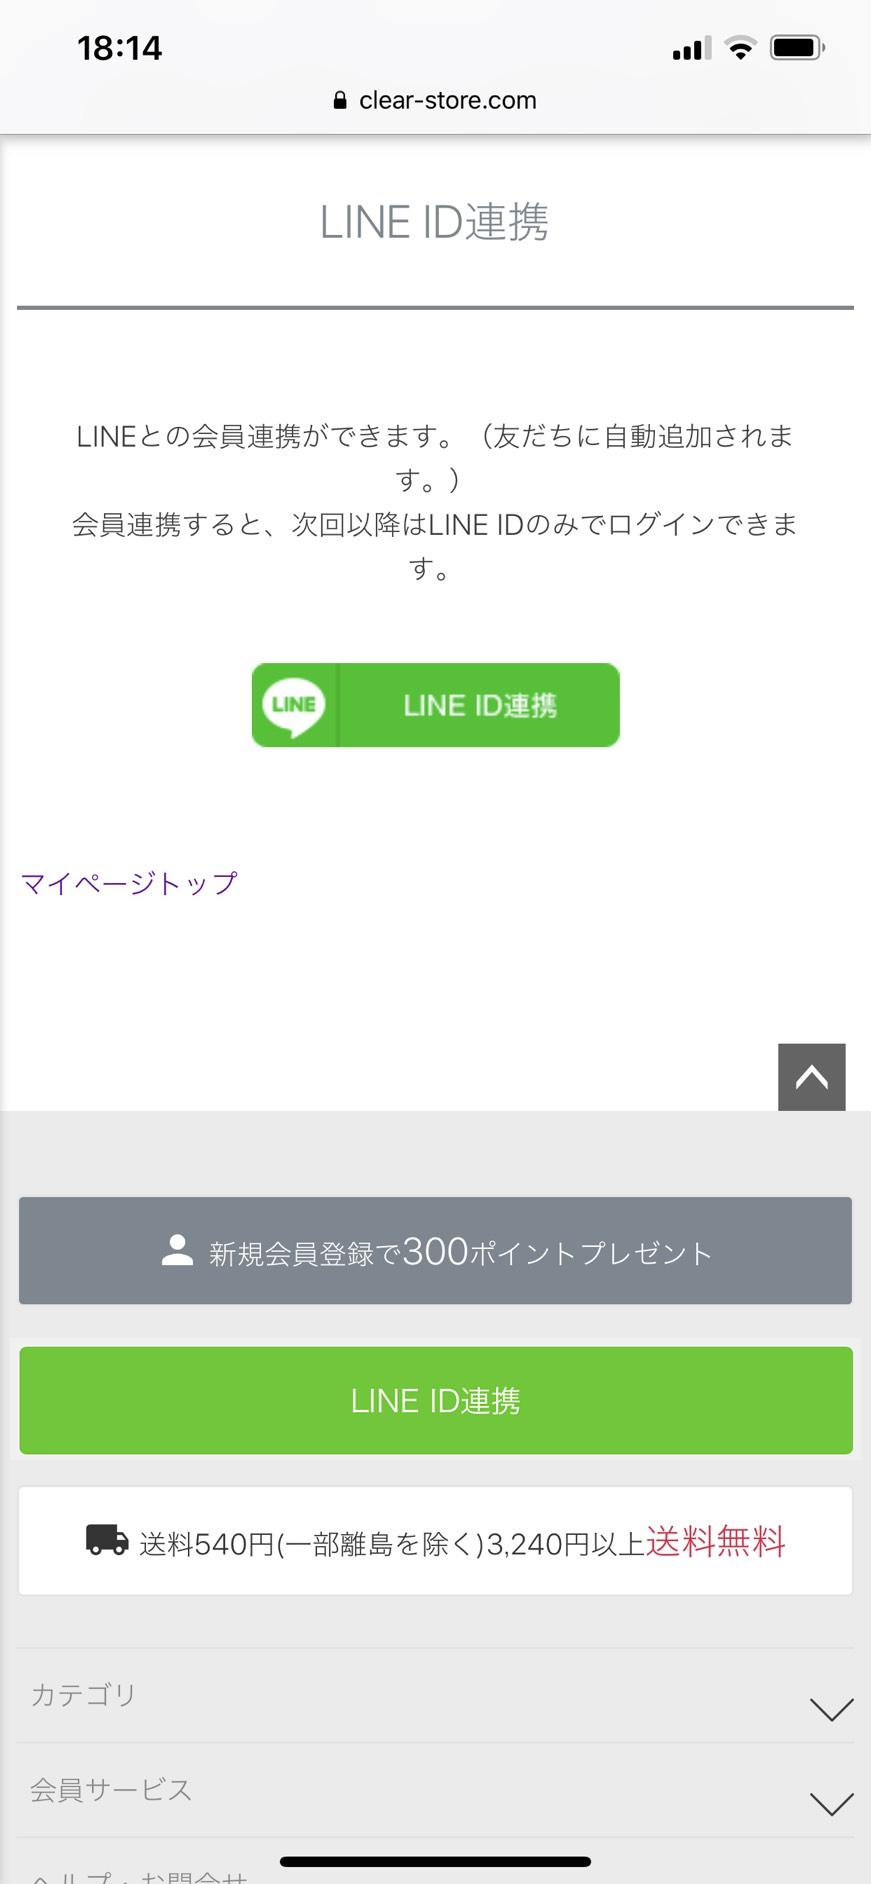 LINE ID連携 STEP3